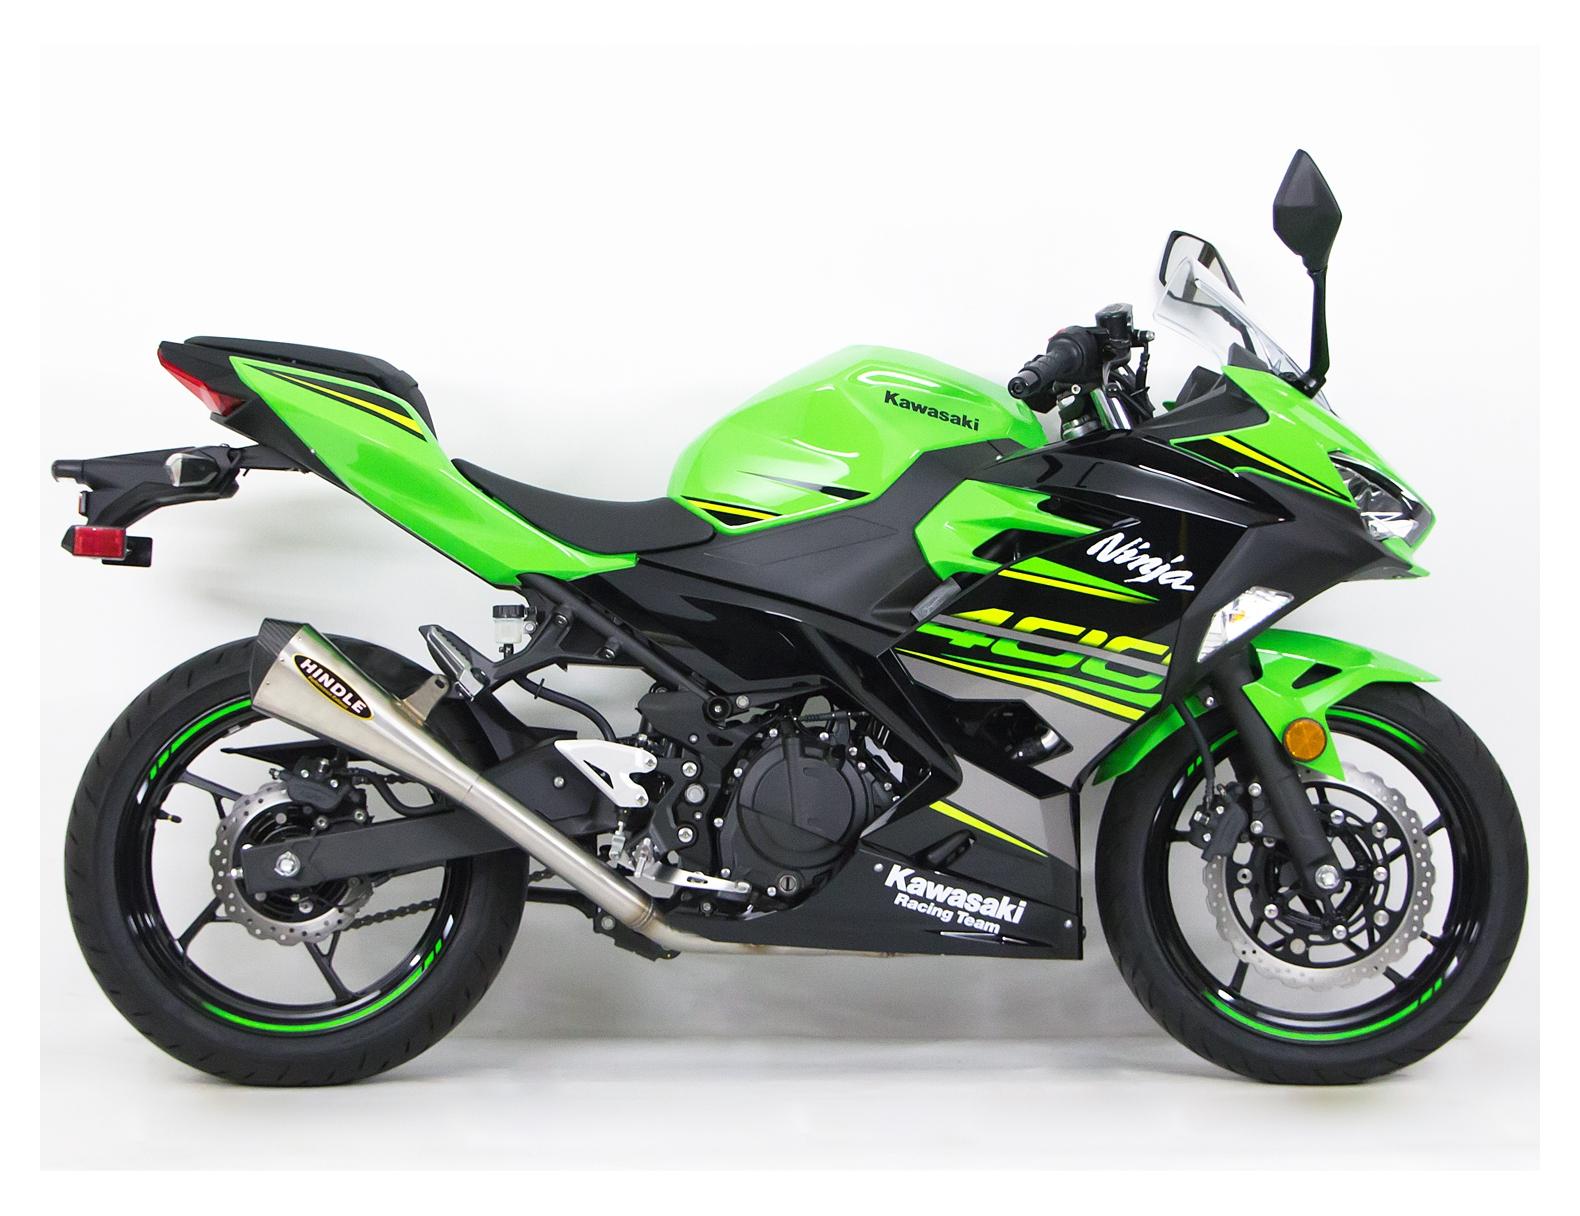 Full Face Cruiser Helmets >> Hindle EVO Megaphone Exhaust System Kawasaki Ninja 400 / Z400 2018-2019 - RevZilla